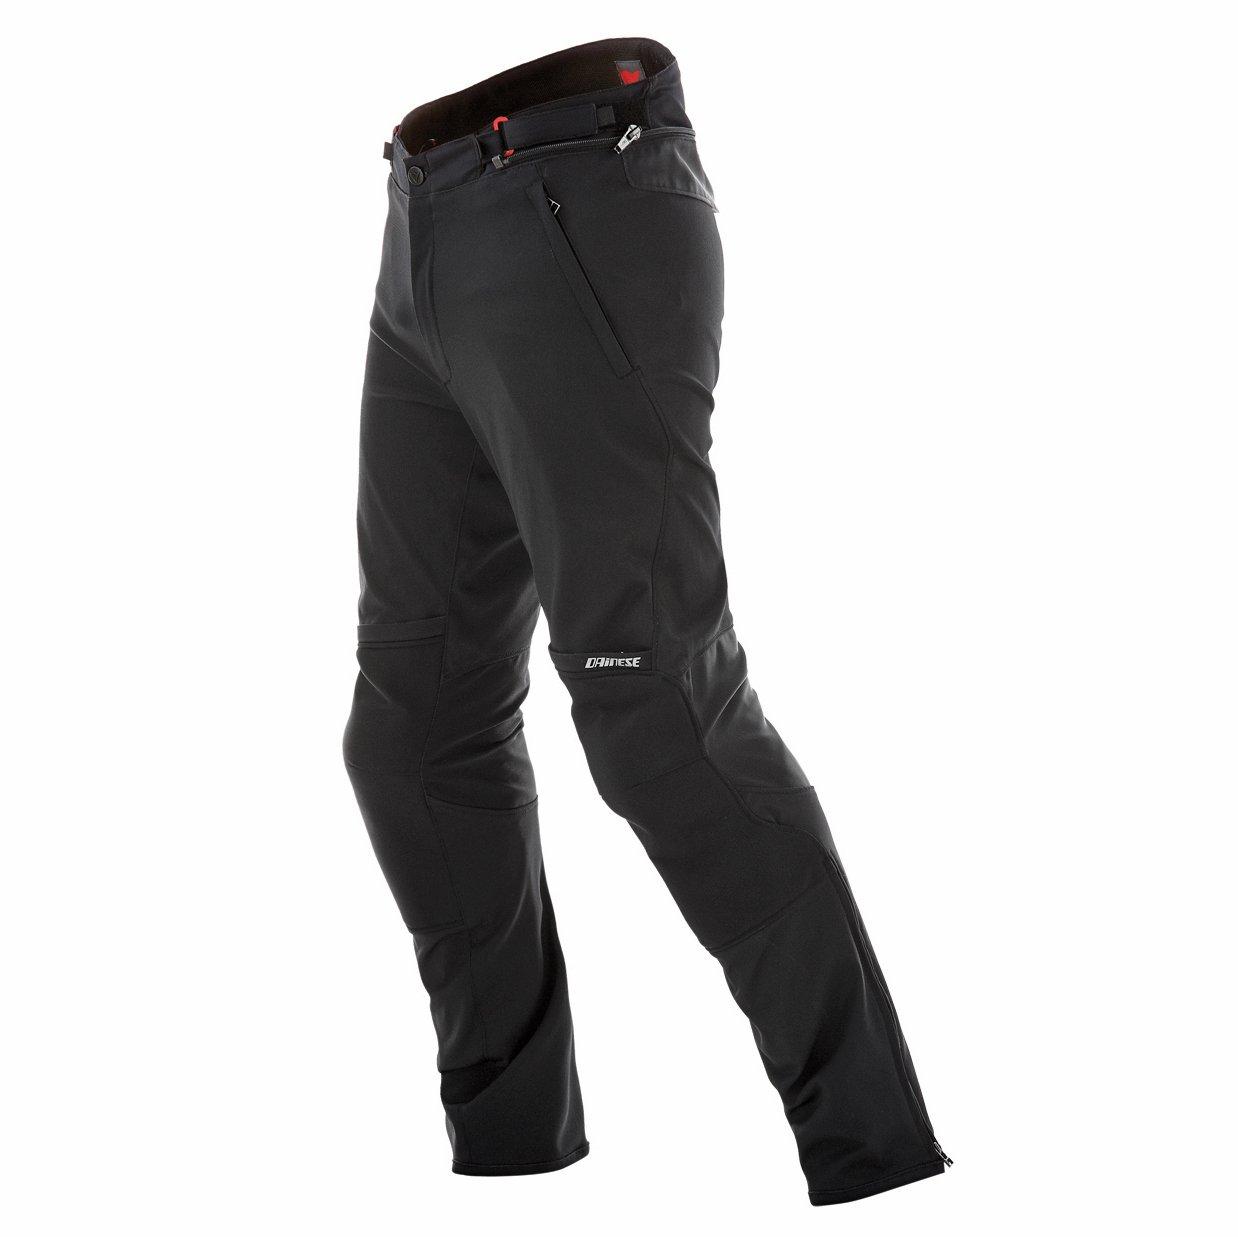 Dainese New Drake Air Tex Men's Street Motorcycle Pants - Black / 56